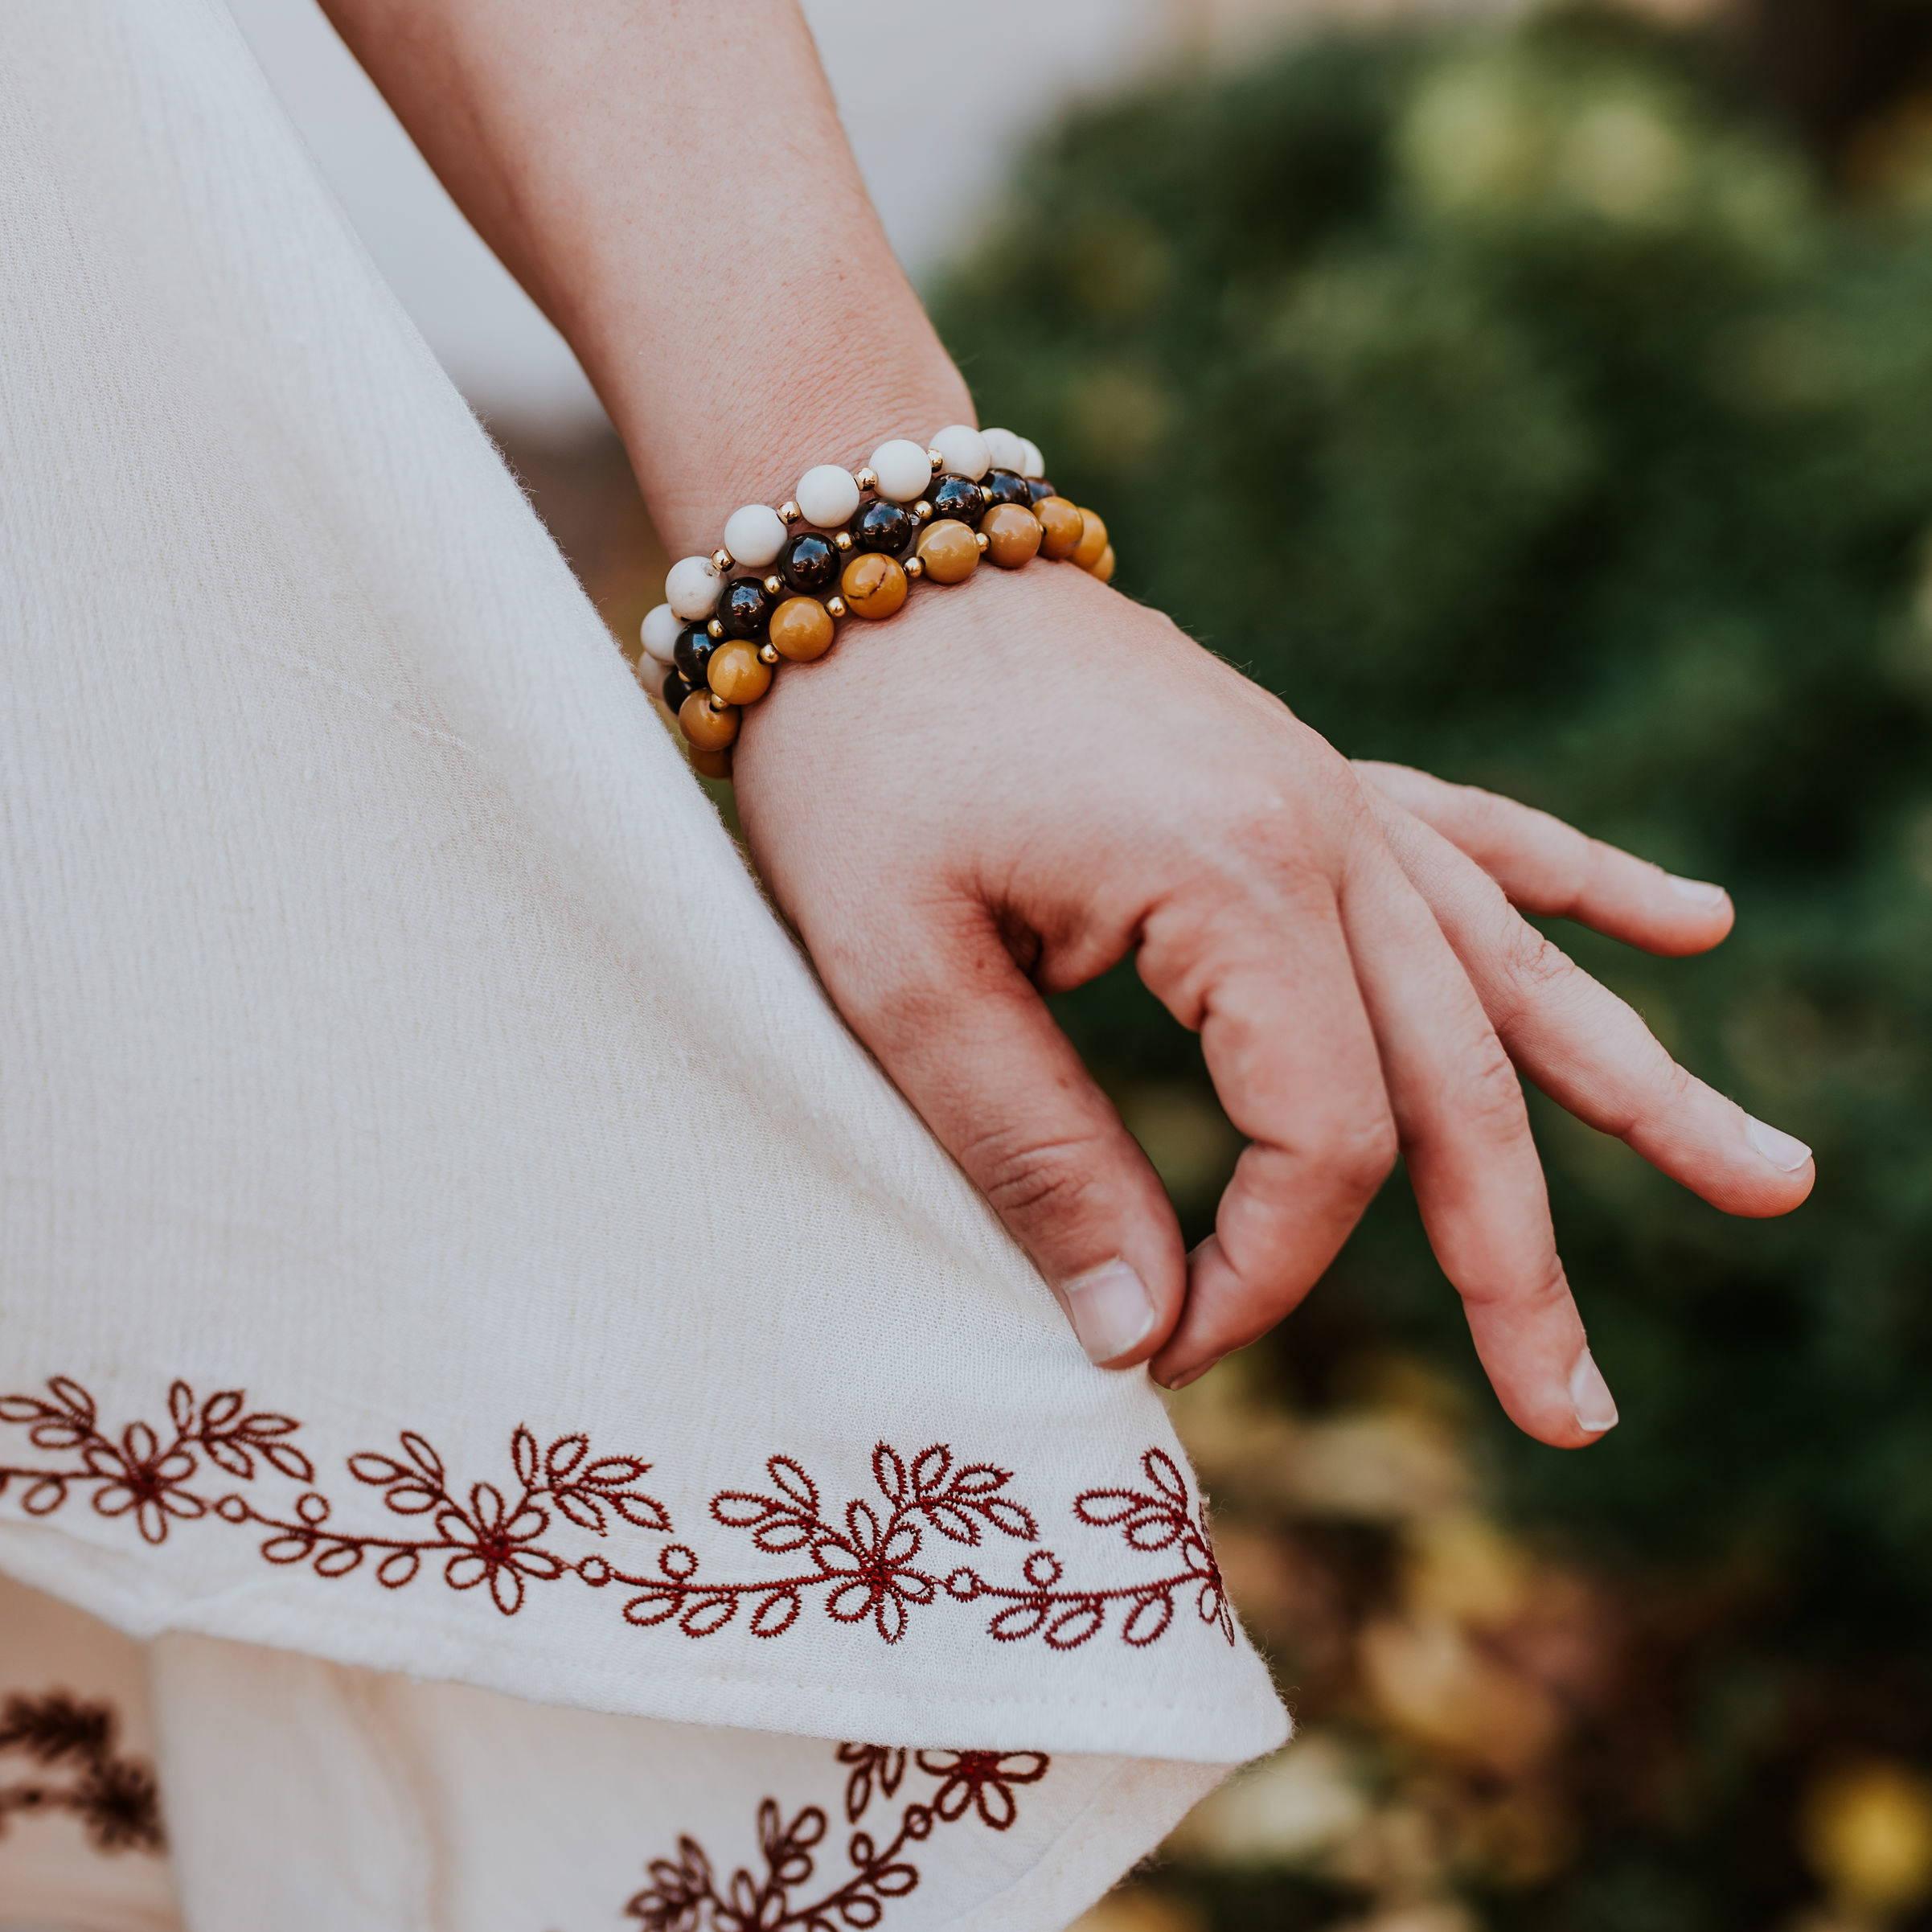 bracelets on wrist holding skirt